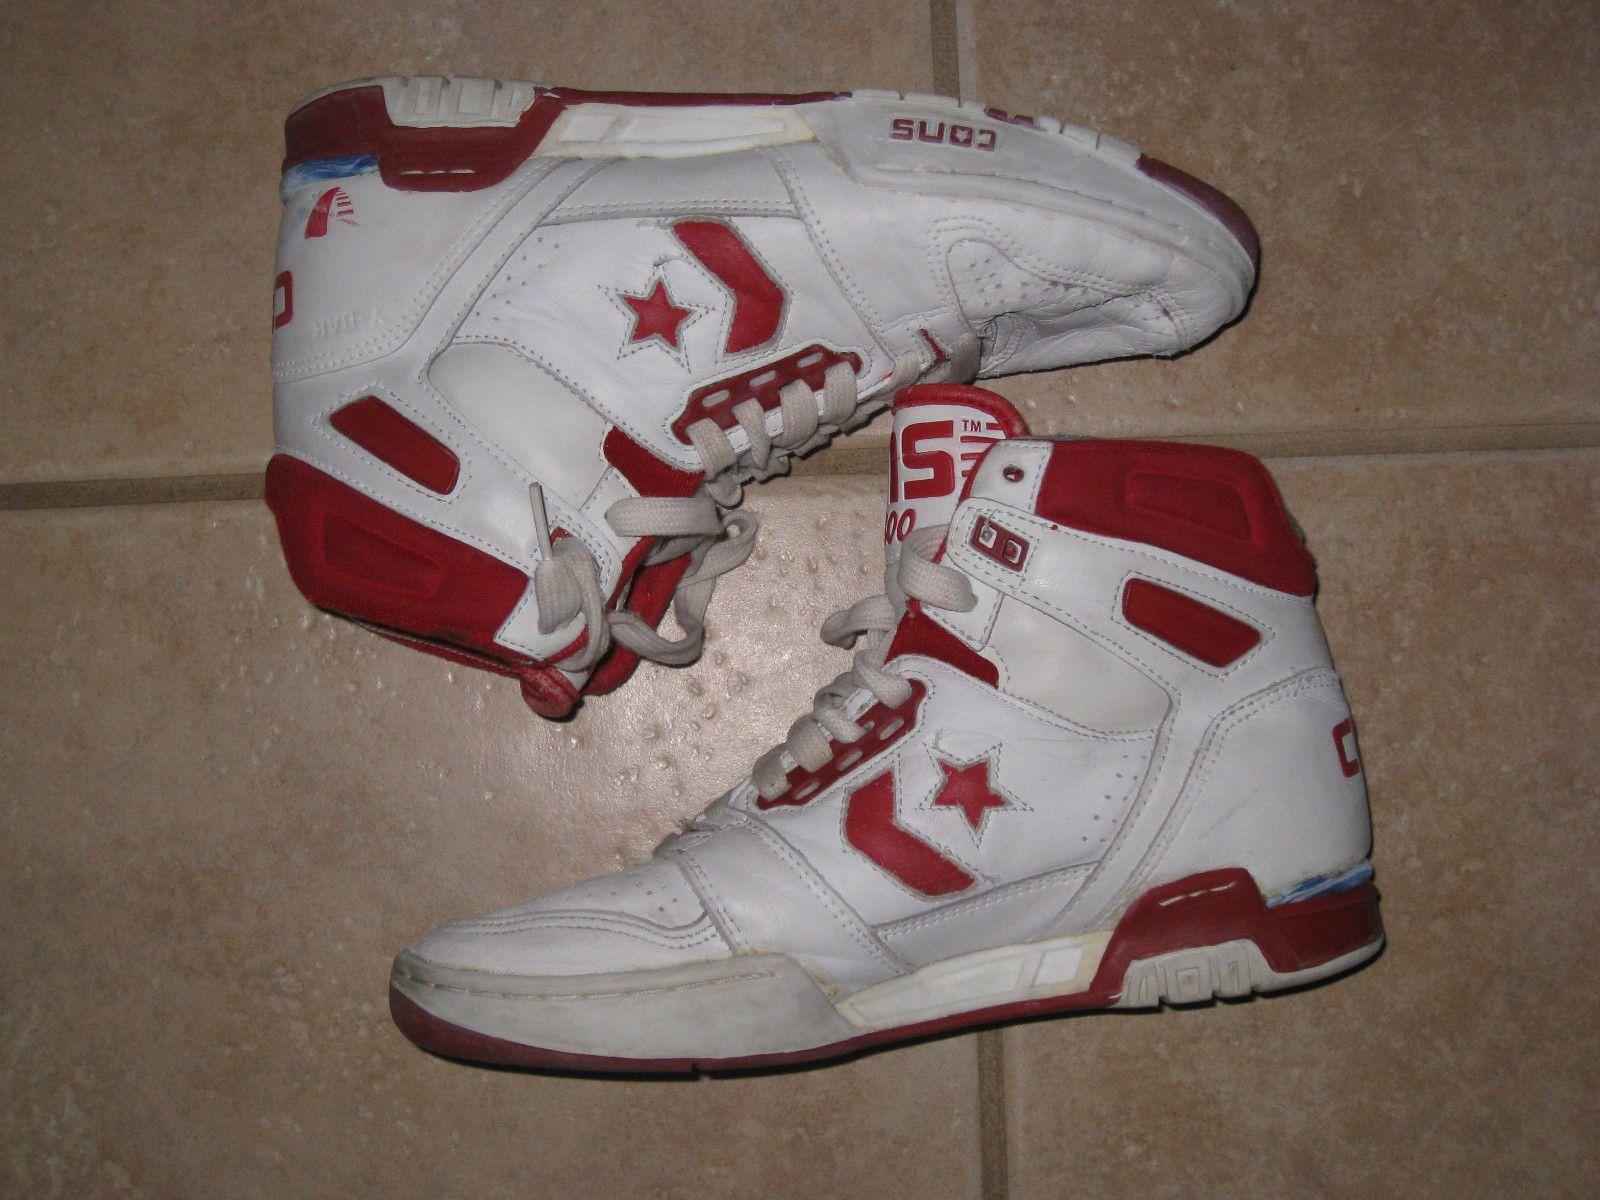 3962cbf838fddb Vintage Converse ERX 300 Sneakers Size 9 5